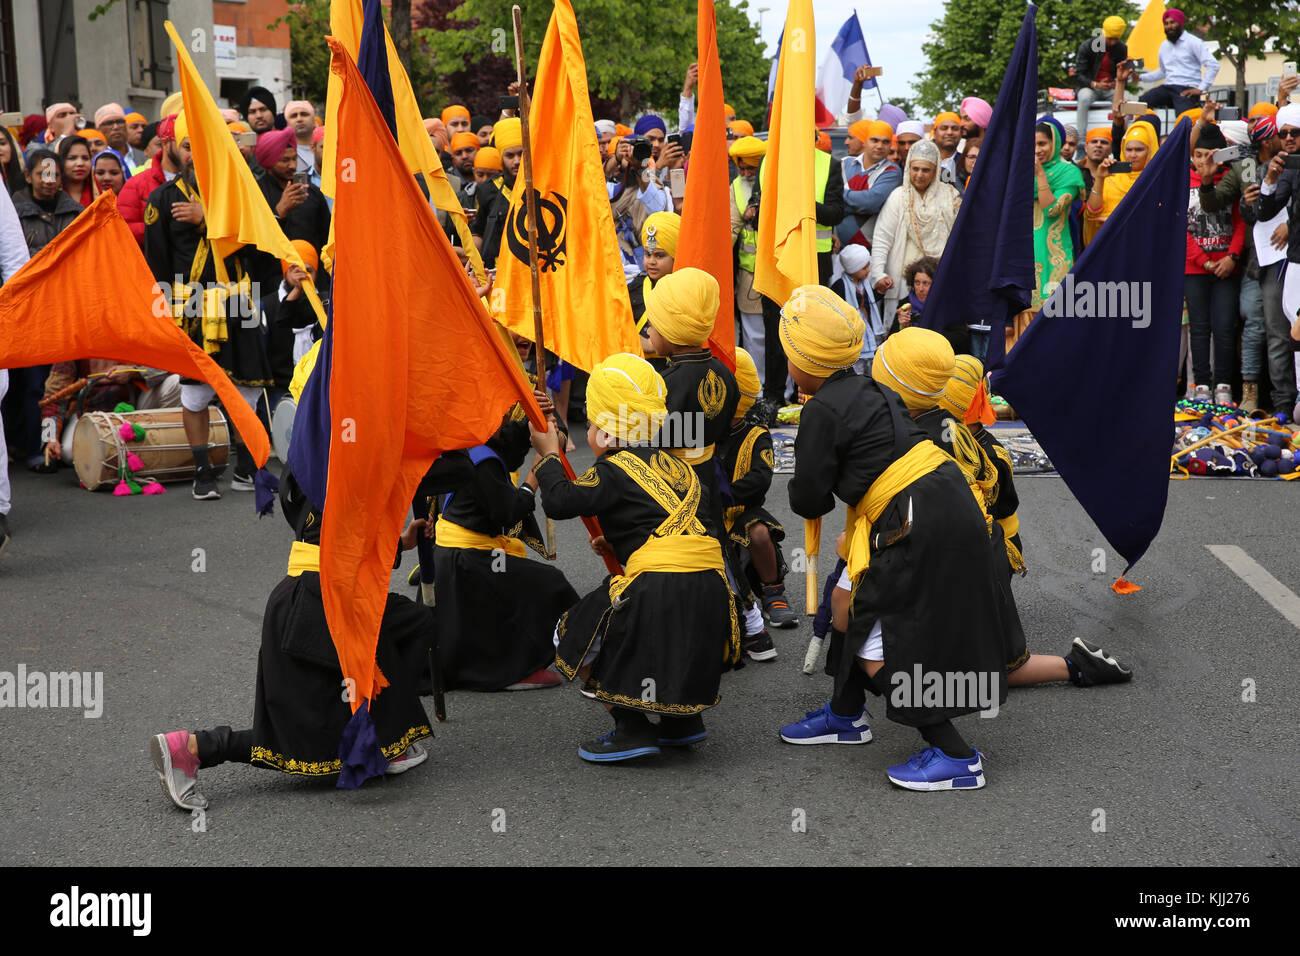 Sikhs celebrating Vaisakhi festival in Bobigny, France. Stock Photo